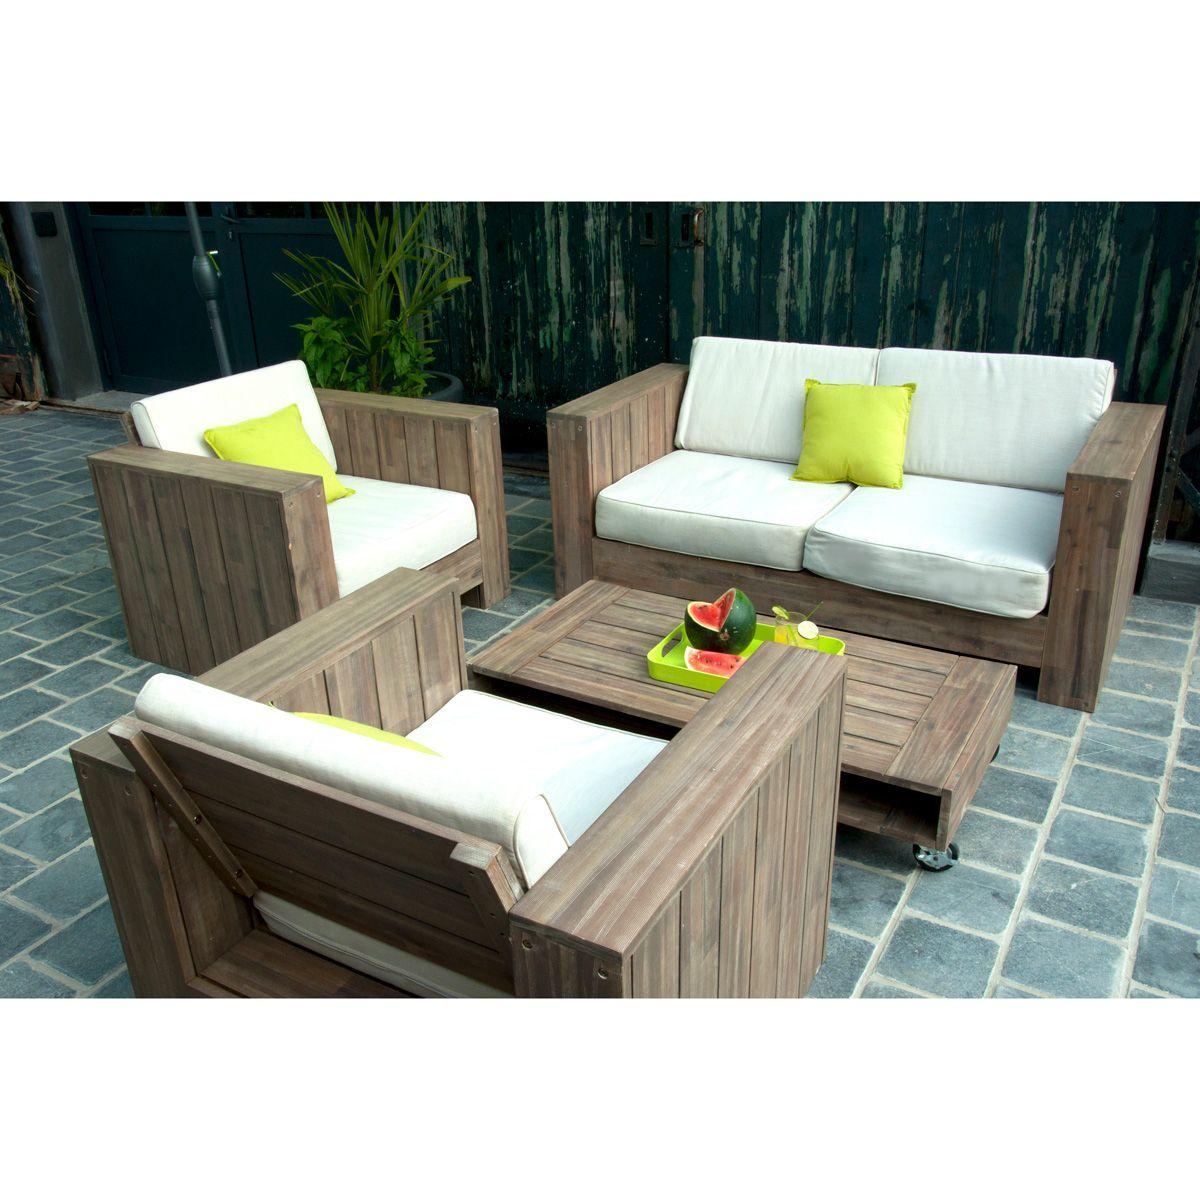 Salon De Jardin Exterieur Design - Yaser.vtngcf.org pour Salon De Jardin Allibert Brico Depot